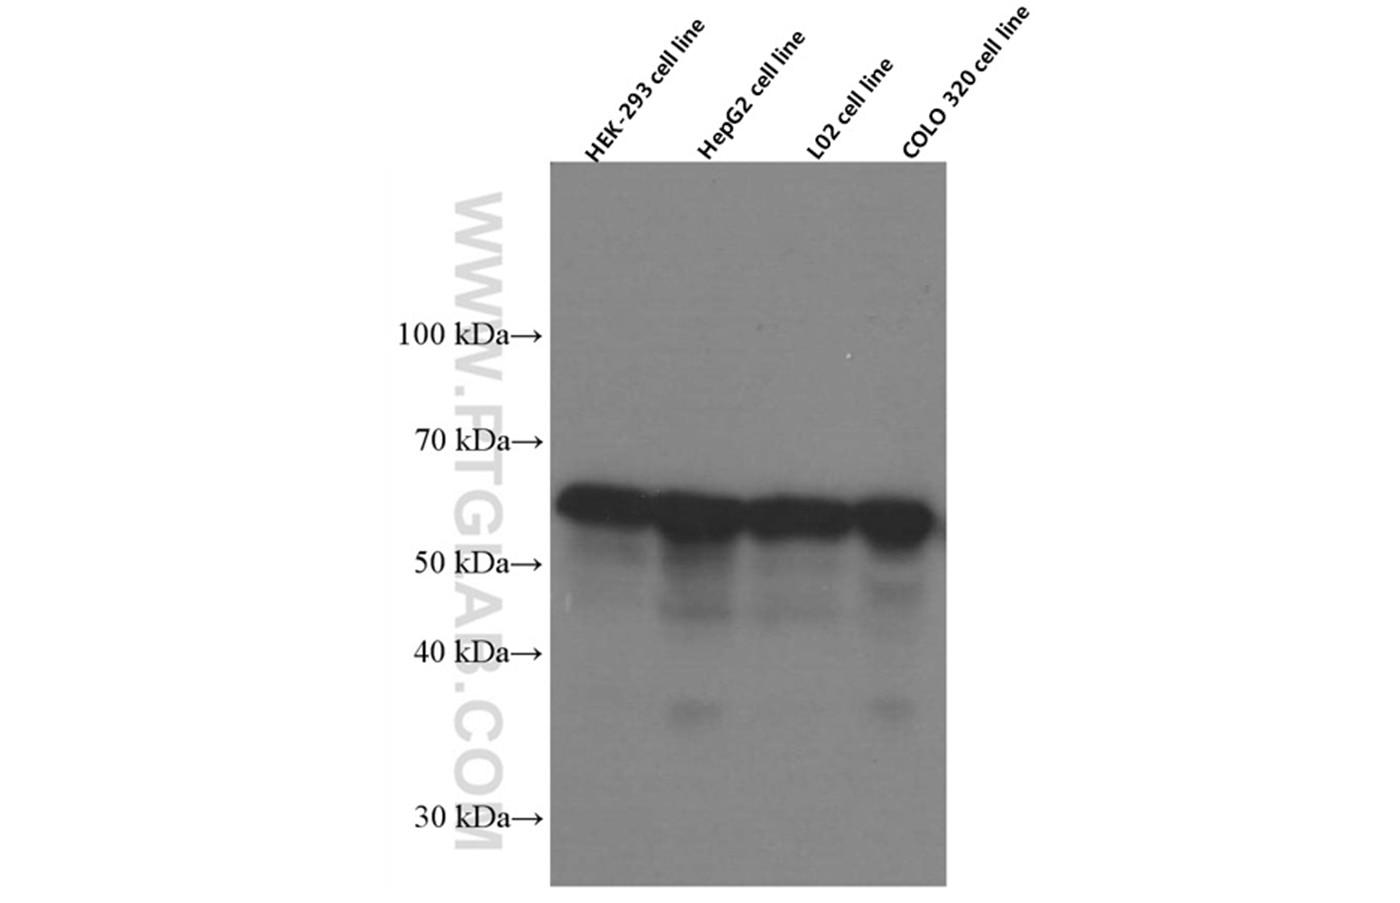 WB analysis using 66422-1-Ig